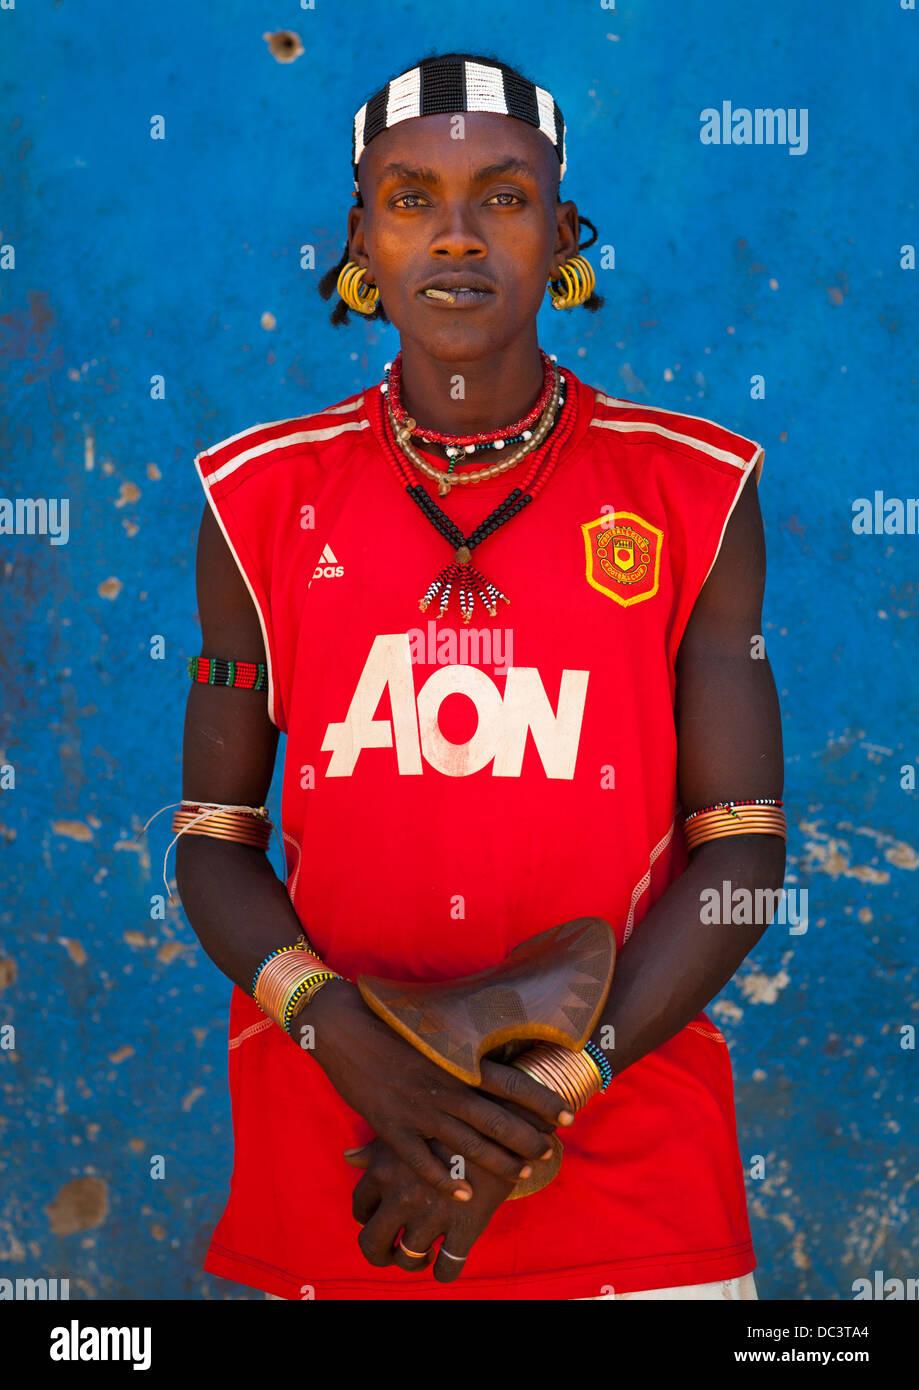 Hamer Tribe Man With A Manchester United Football Shirt Turmi Omo Stock Photo Alamy